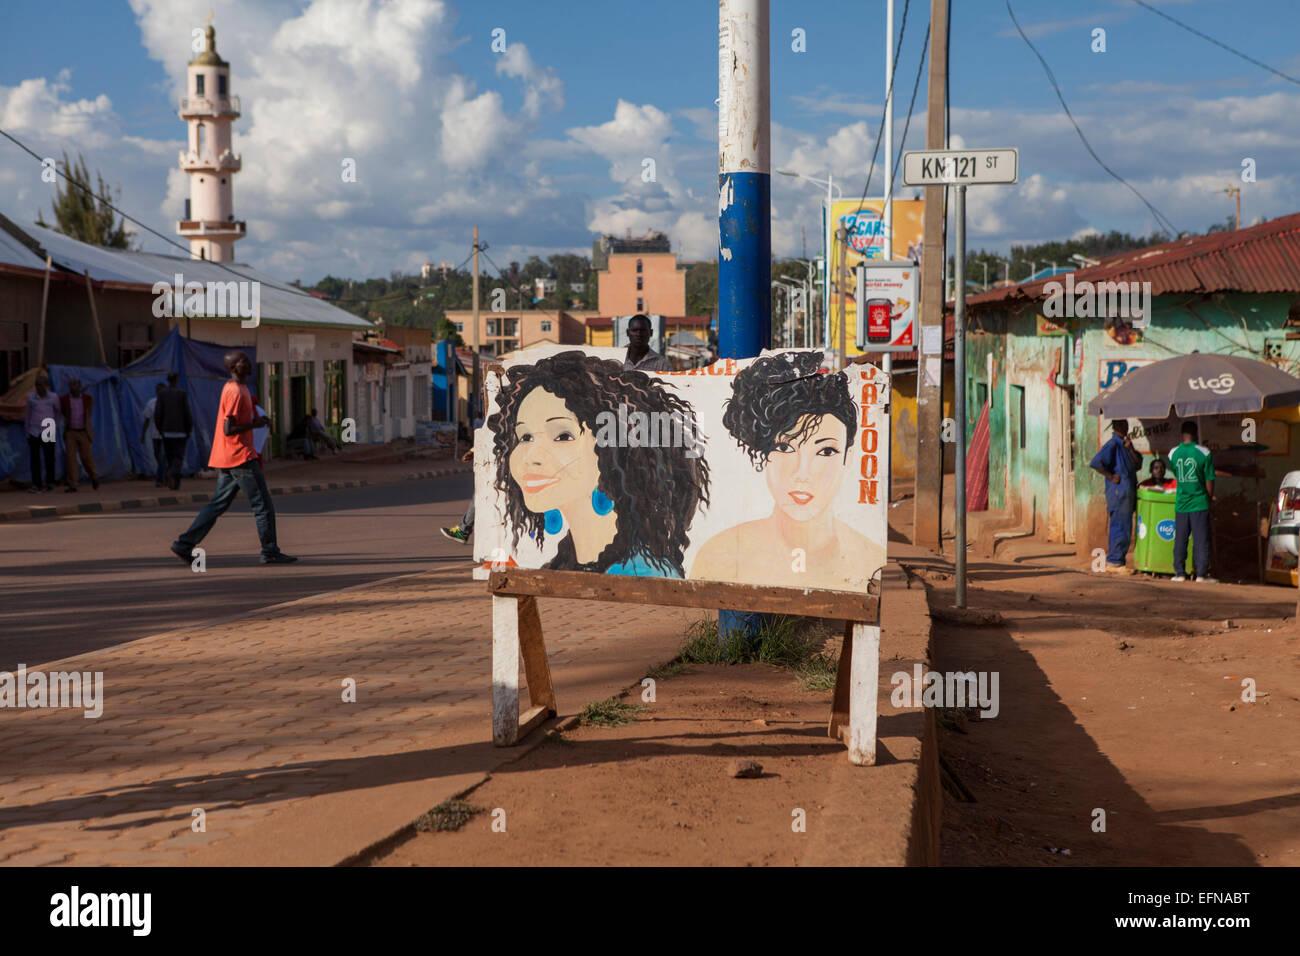 Painted sign for a hair salon in Nyamirambo the Muslim quarter of Kigali, Rwanda - Stock Image